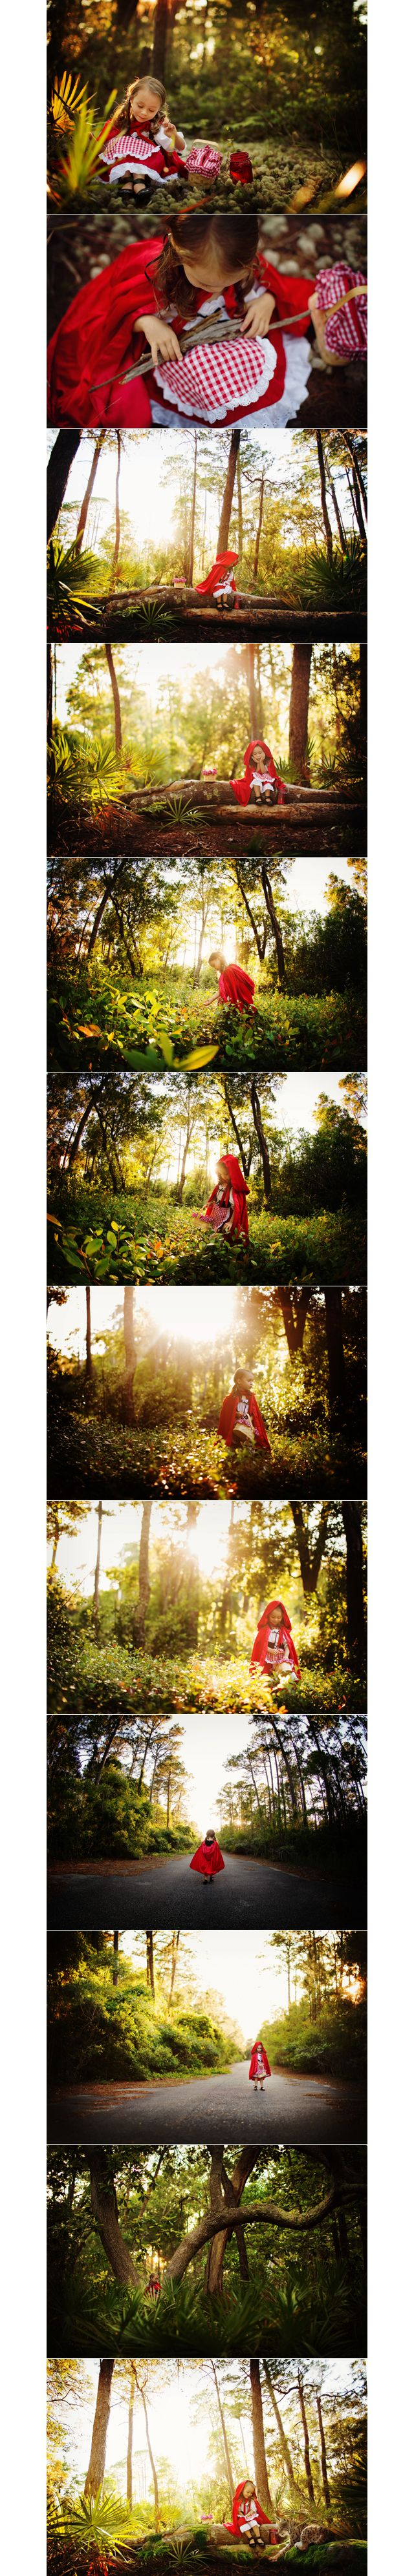 I love the idea of a fairytale photo shoot. Cute for little girls or even high school seniors.